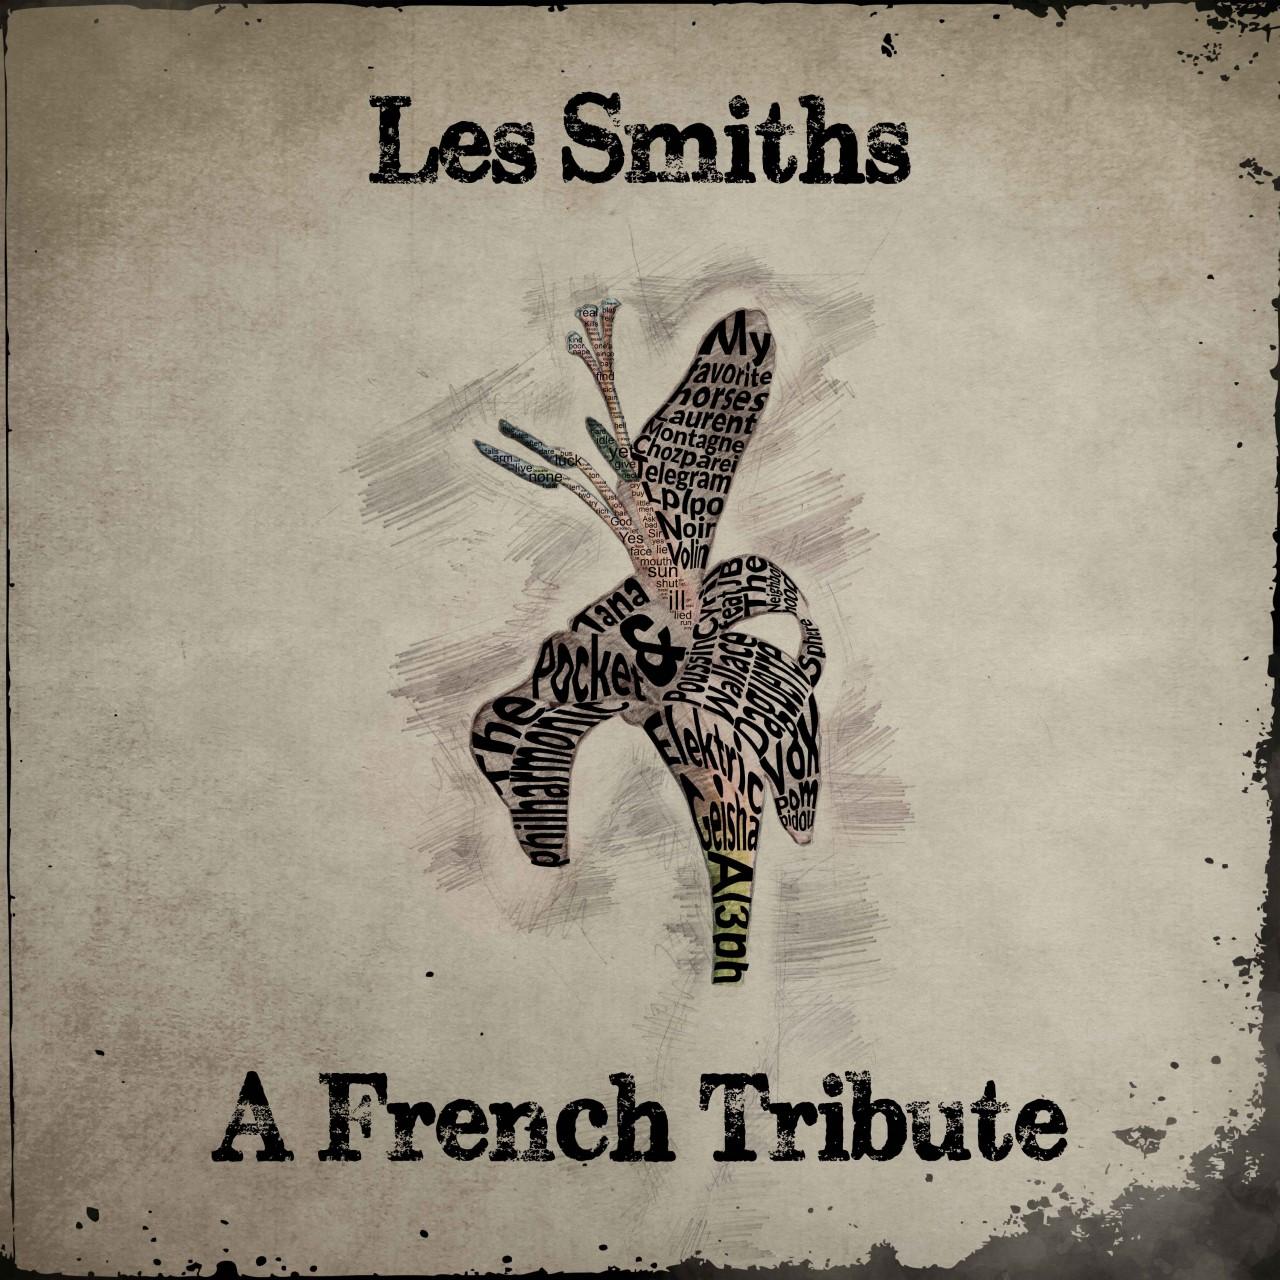 Les Smiths